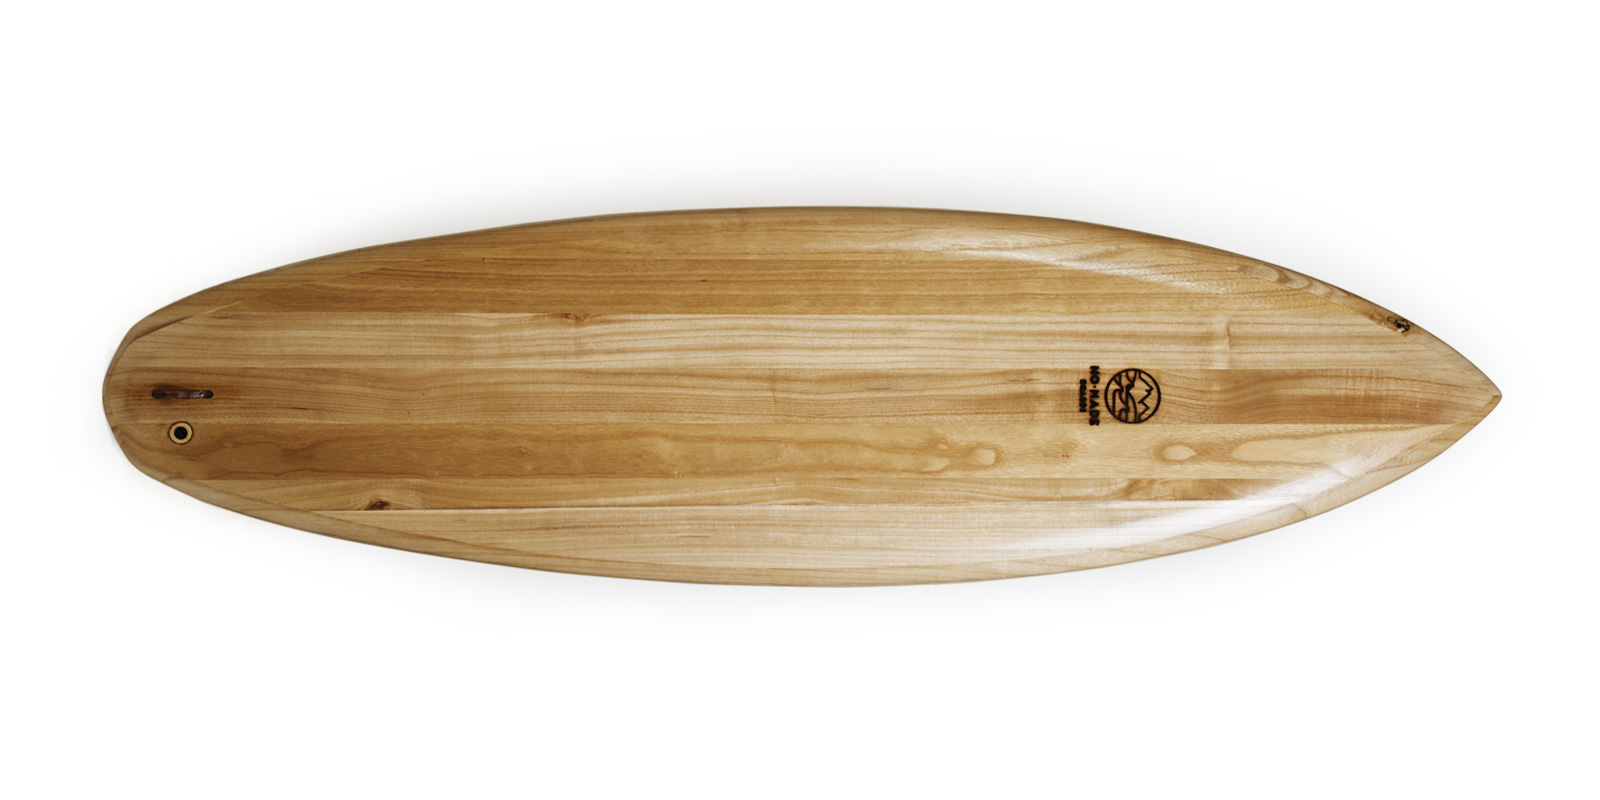 wooden surboard